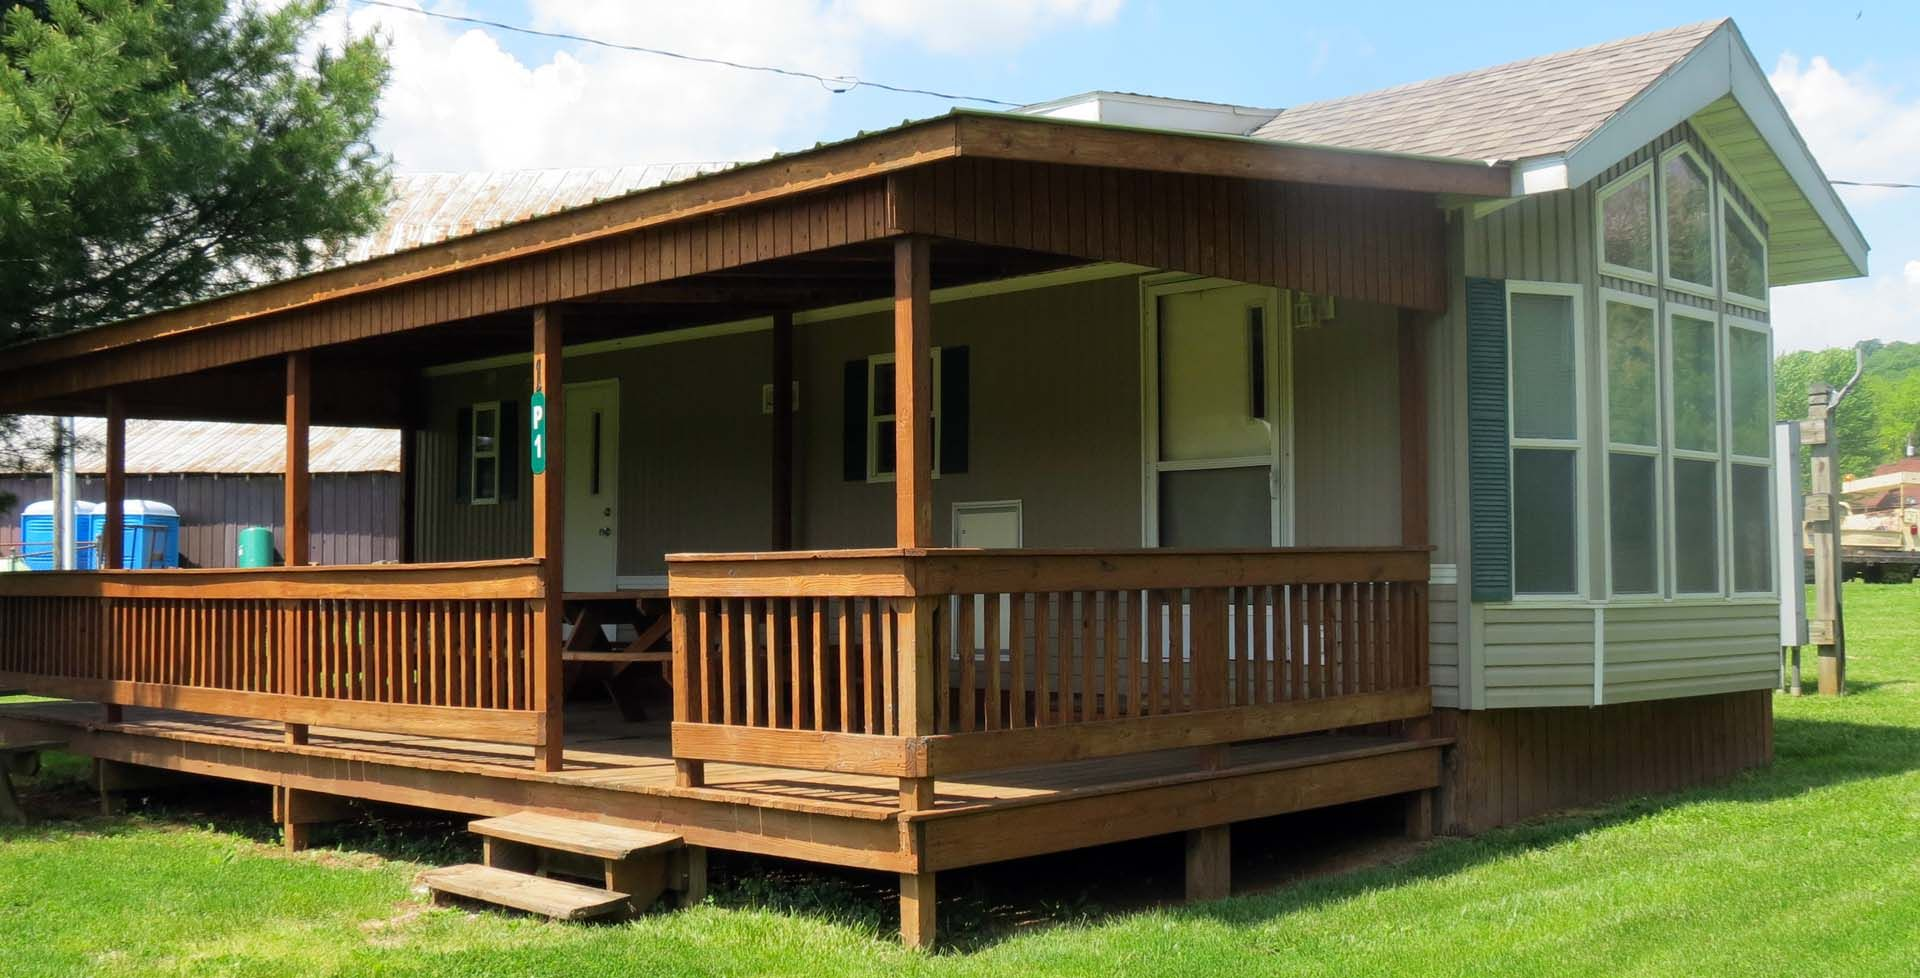 Long S Retreat Two Bedroom Park Model Cabin With Loft